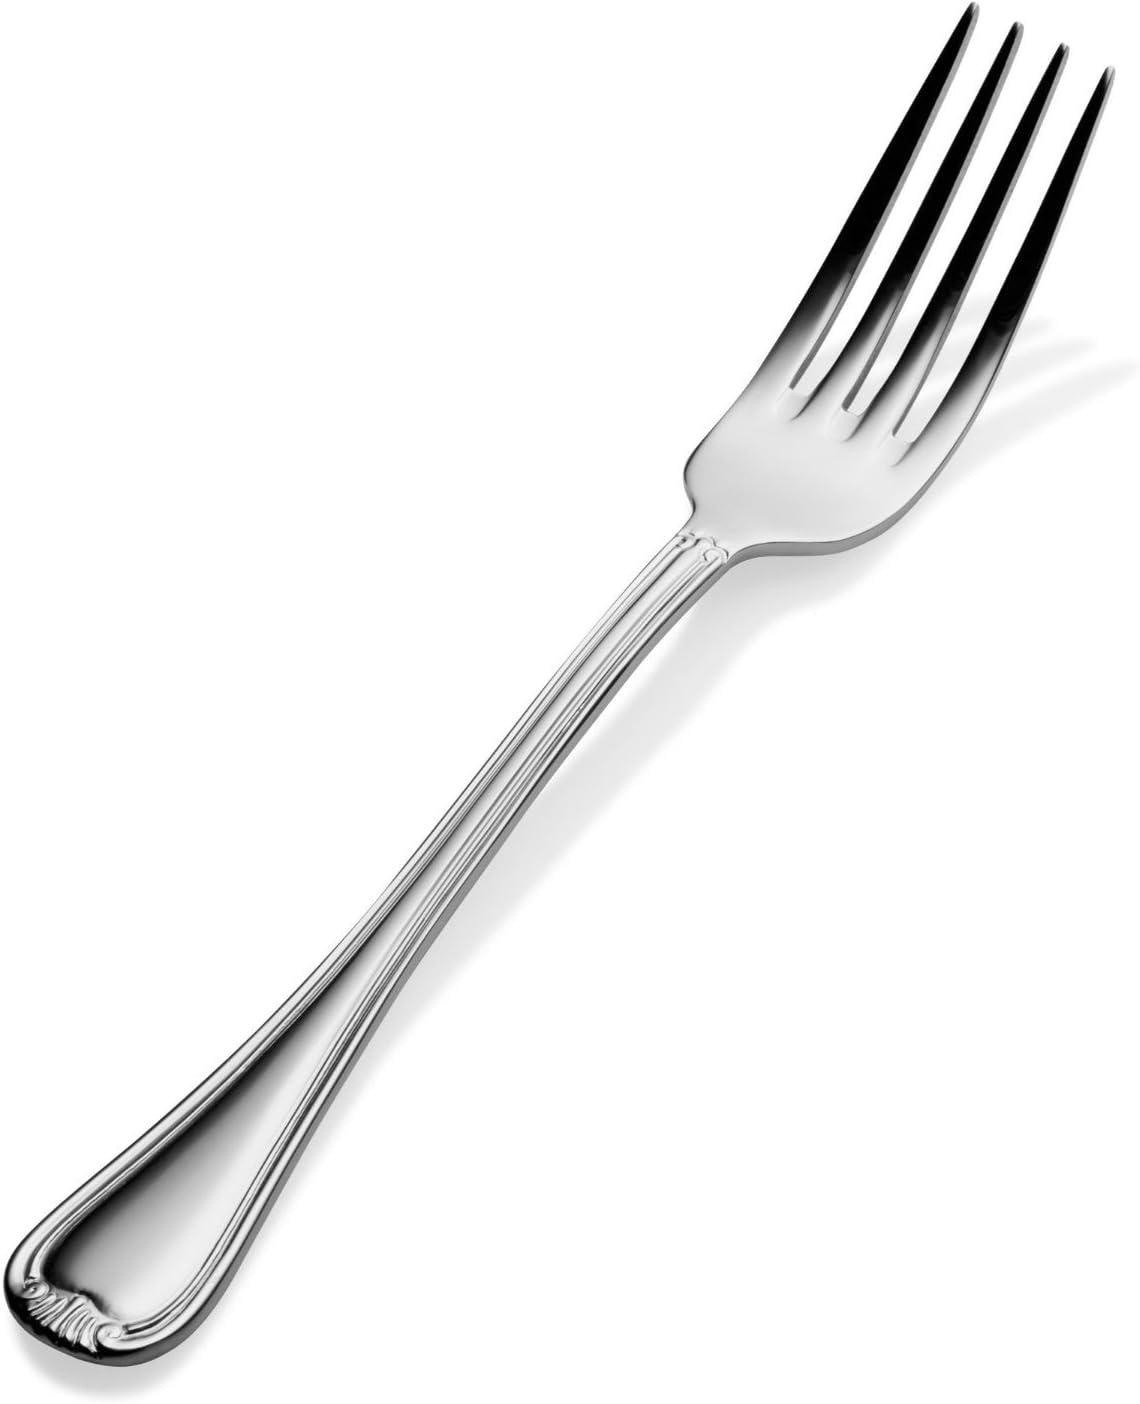 Renoir Euro Dinner Fork 8.17 inch Ct 144 Award-winning store 8 Stainless 18 Max 50% OFF